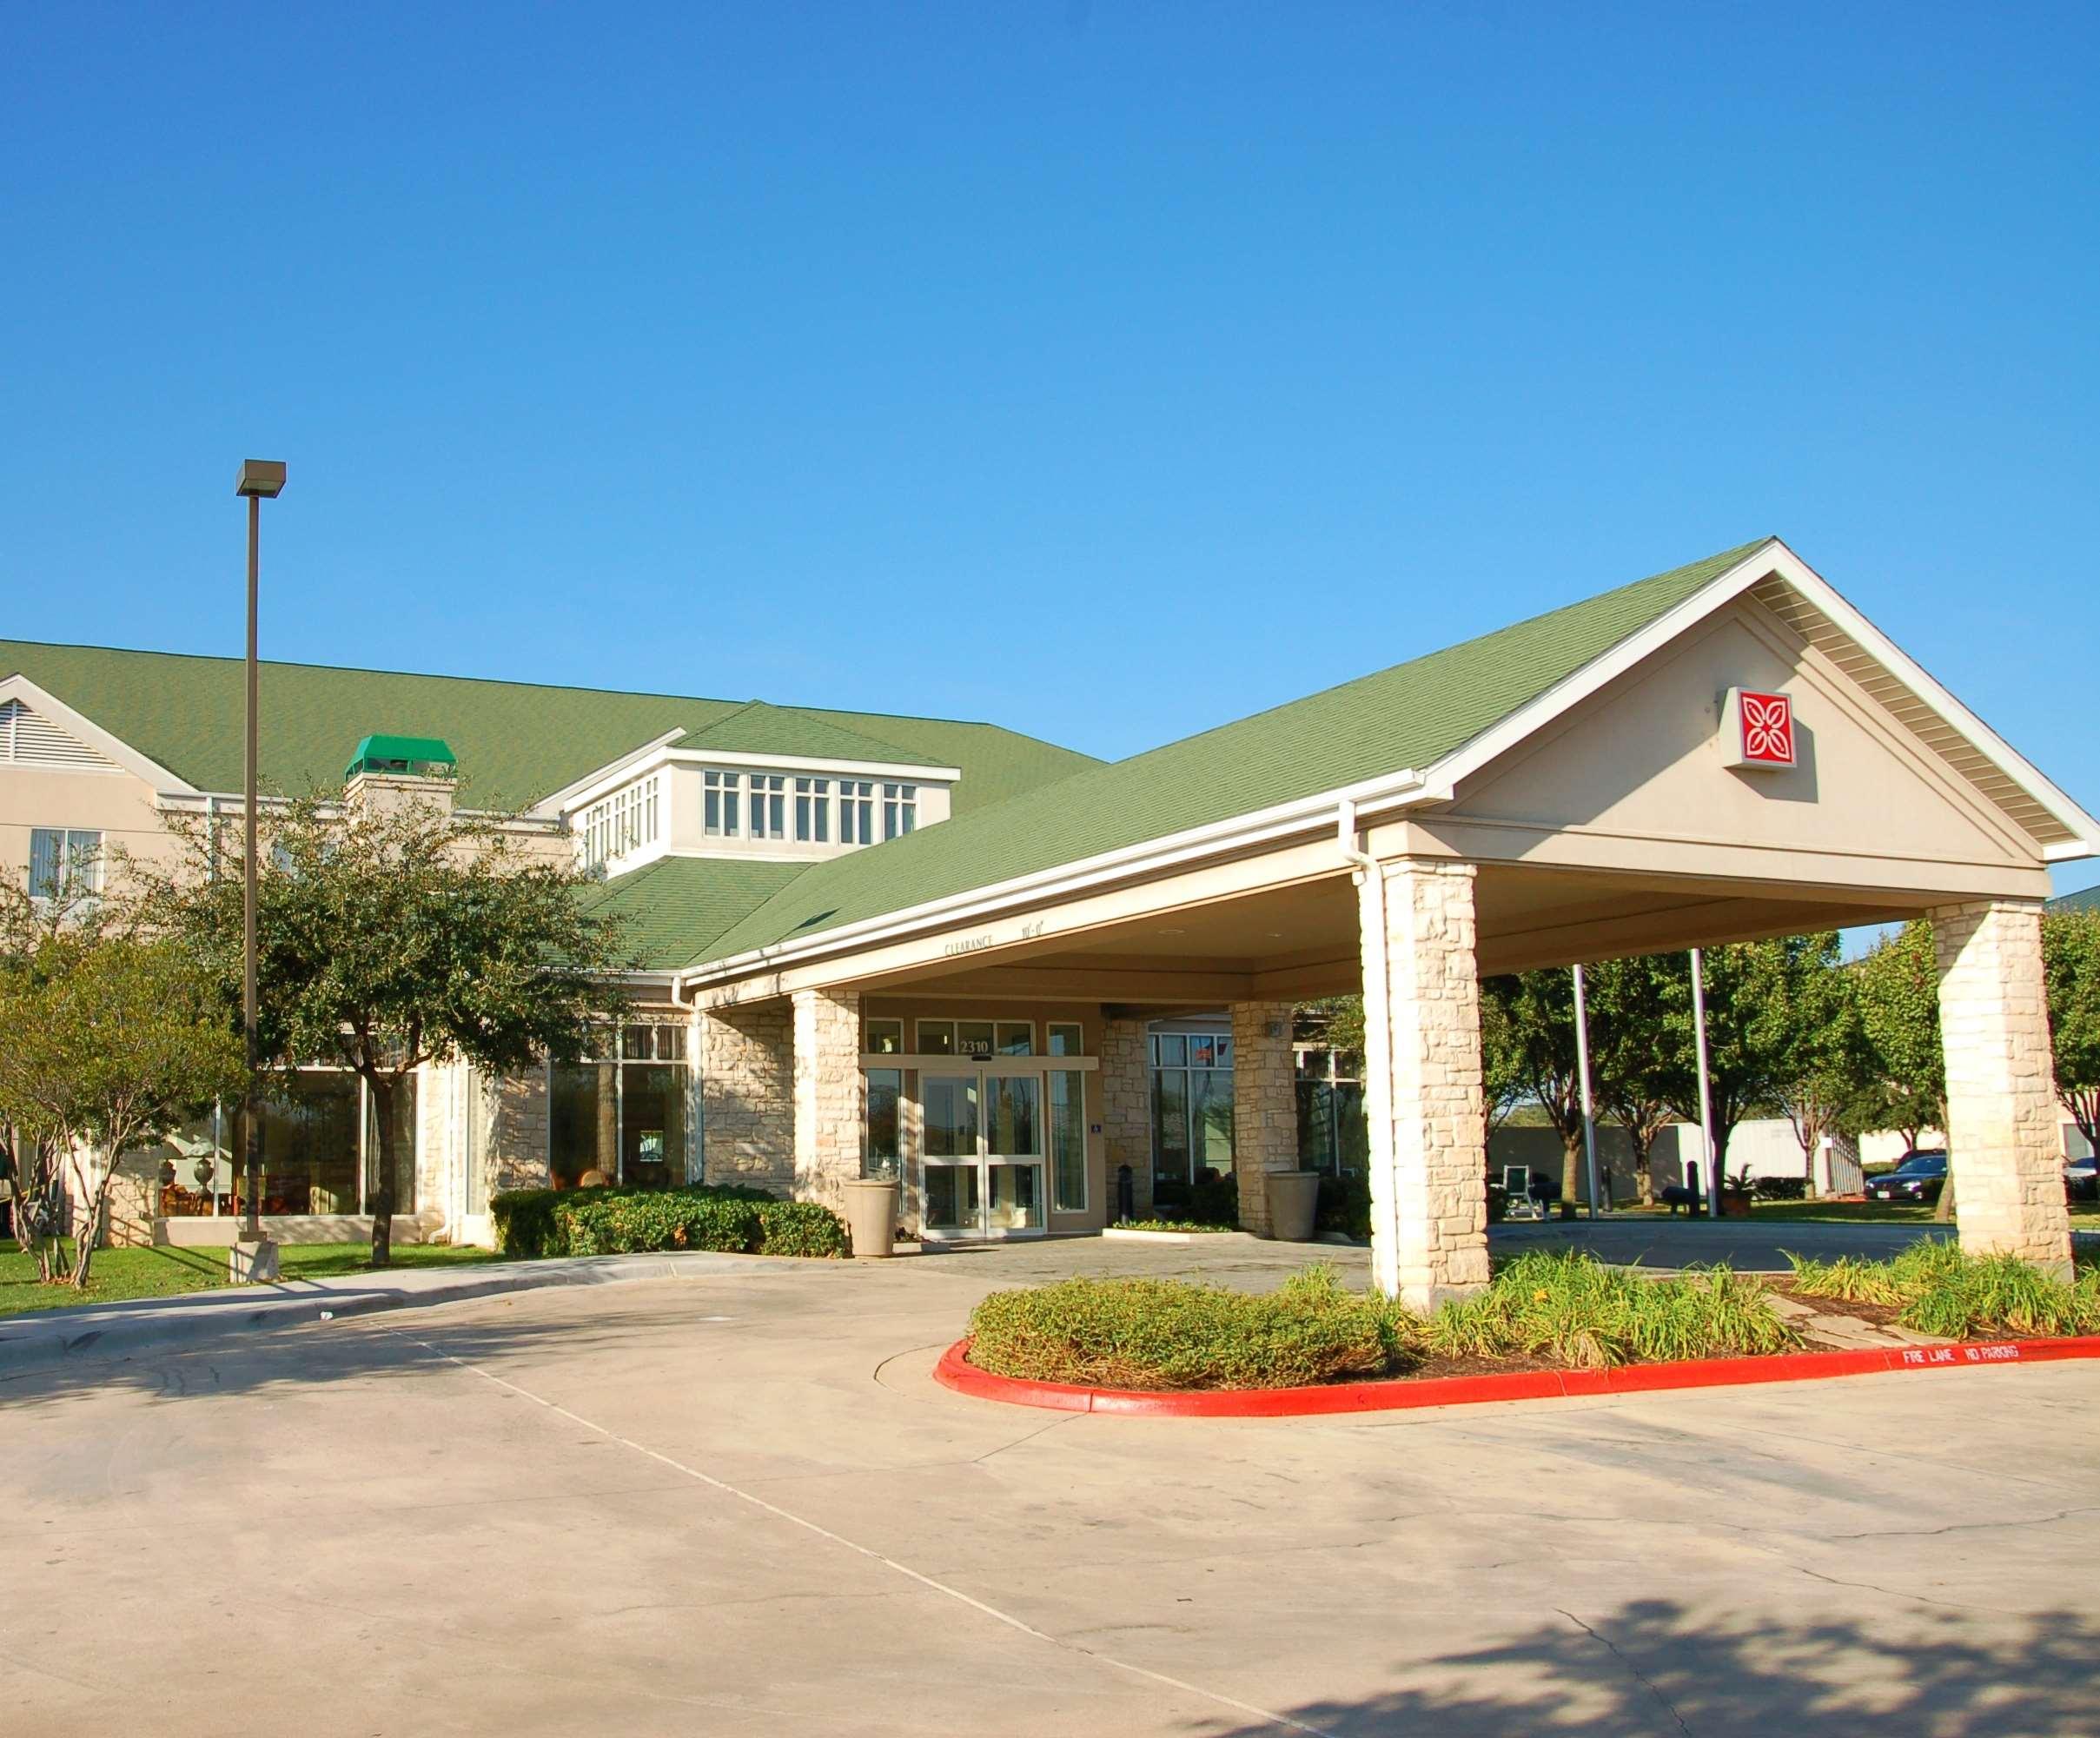 Hilton Garden Inn Austin/Round Rock image 1